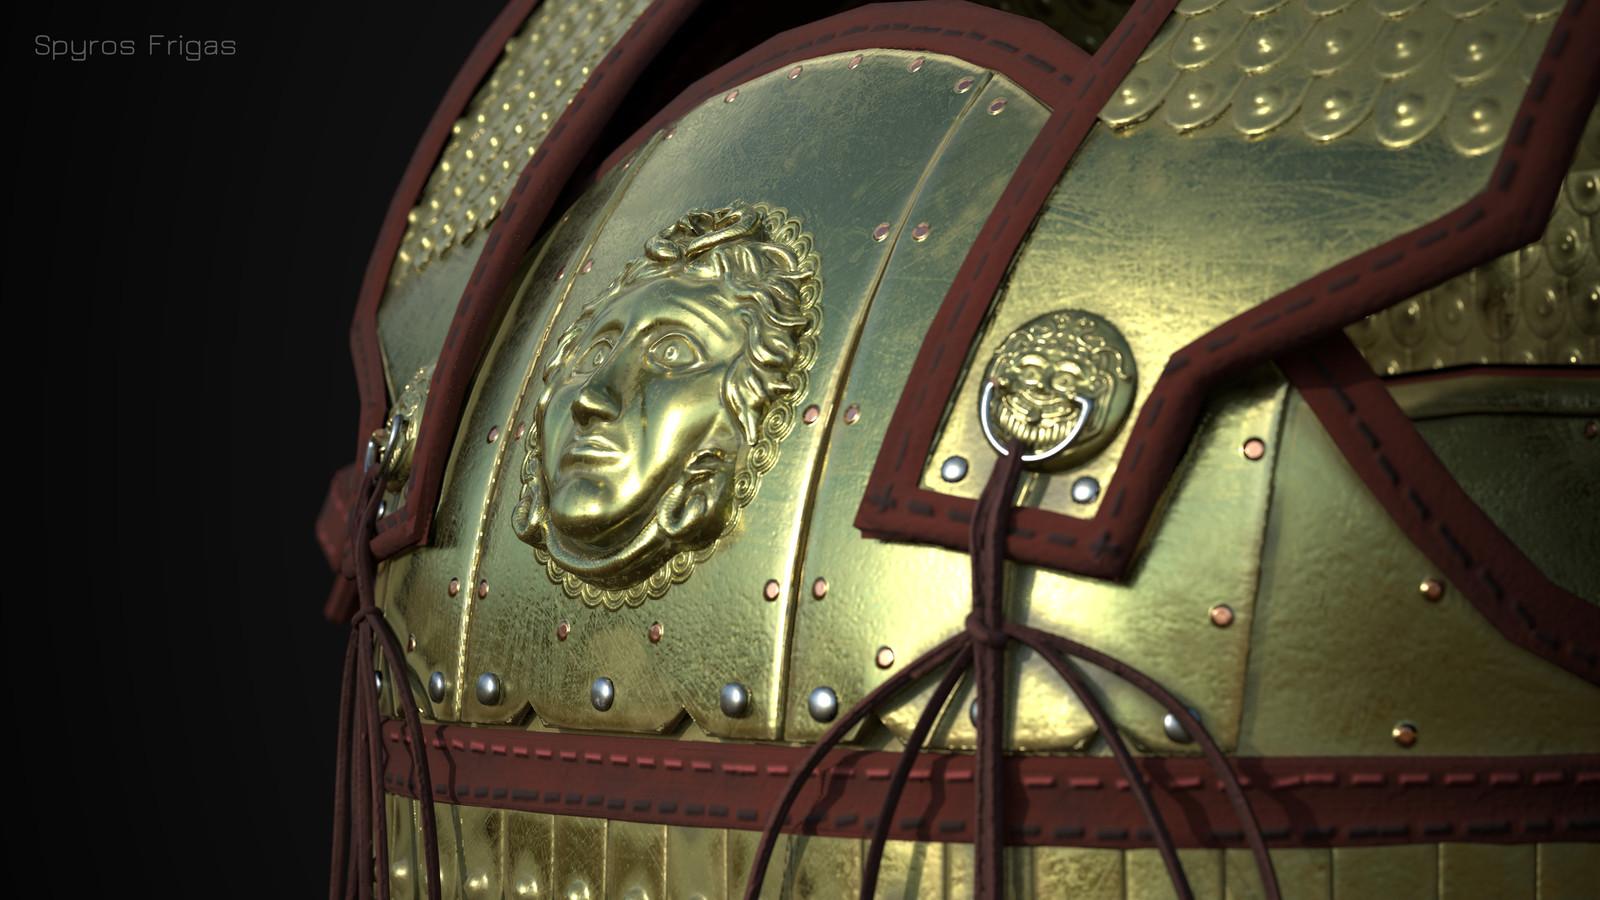 Heavy Linothorax, ancient Greek armor